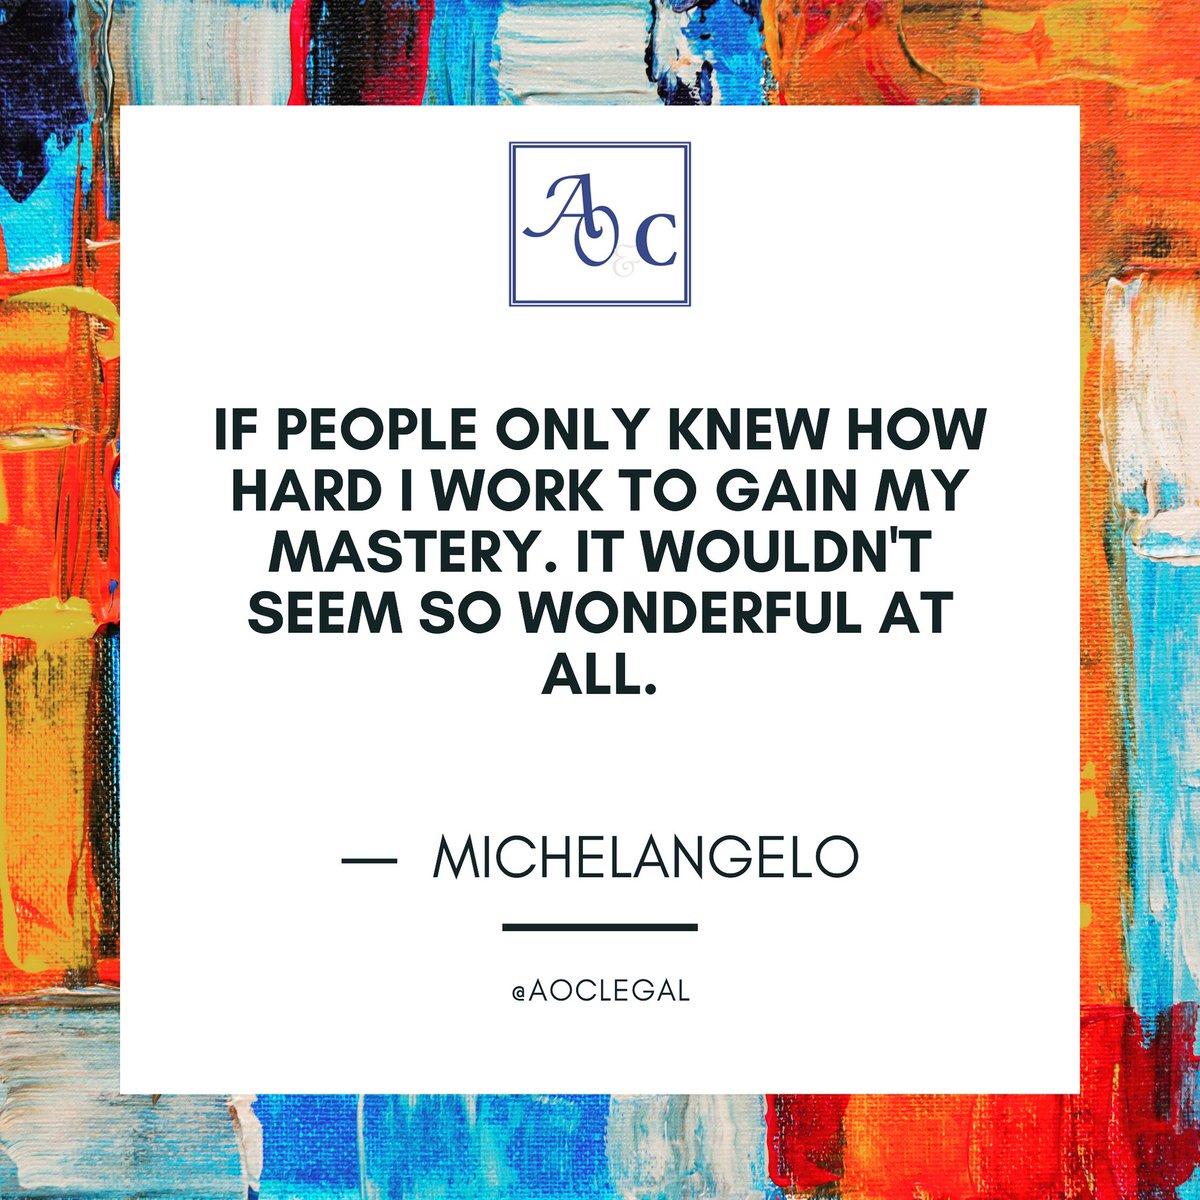 Keep working, gain your mastery.   #mondaymotivation #artlawyers #artlaw #aoclegal #legalnaija